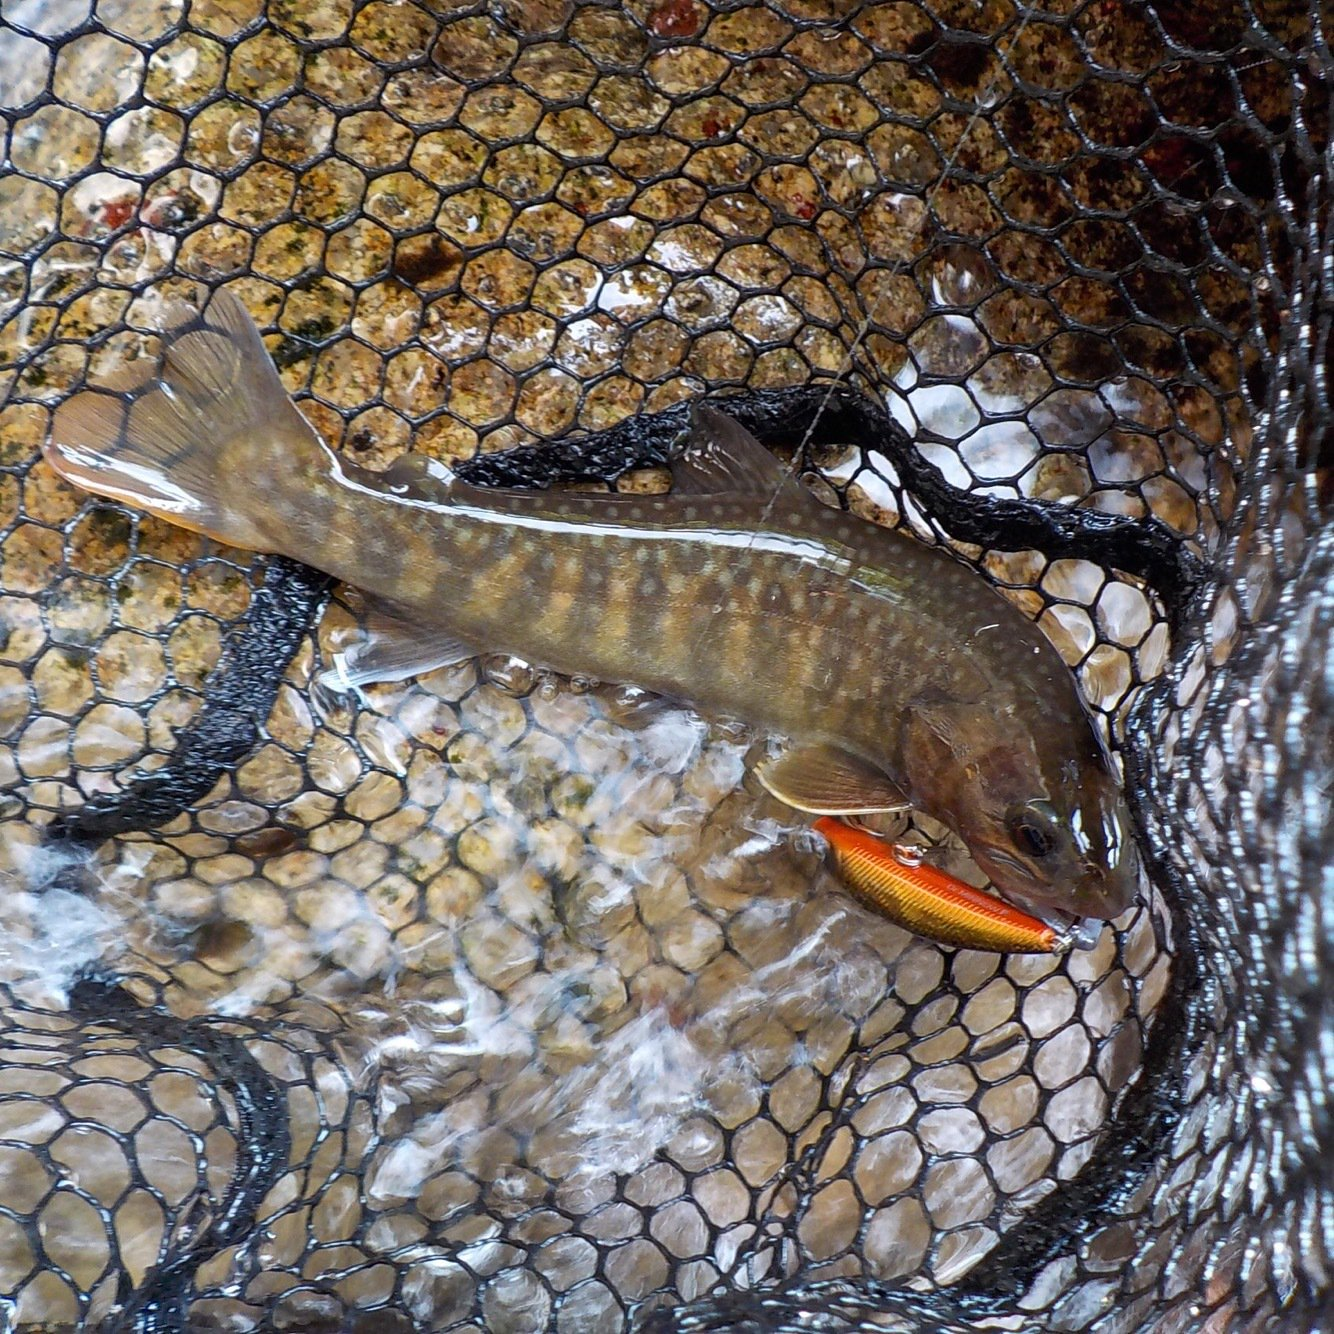 yuu_samさんの投稿画像,写っている魚はイワナ